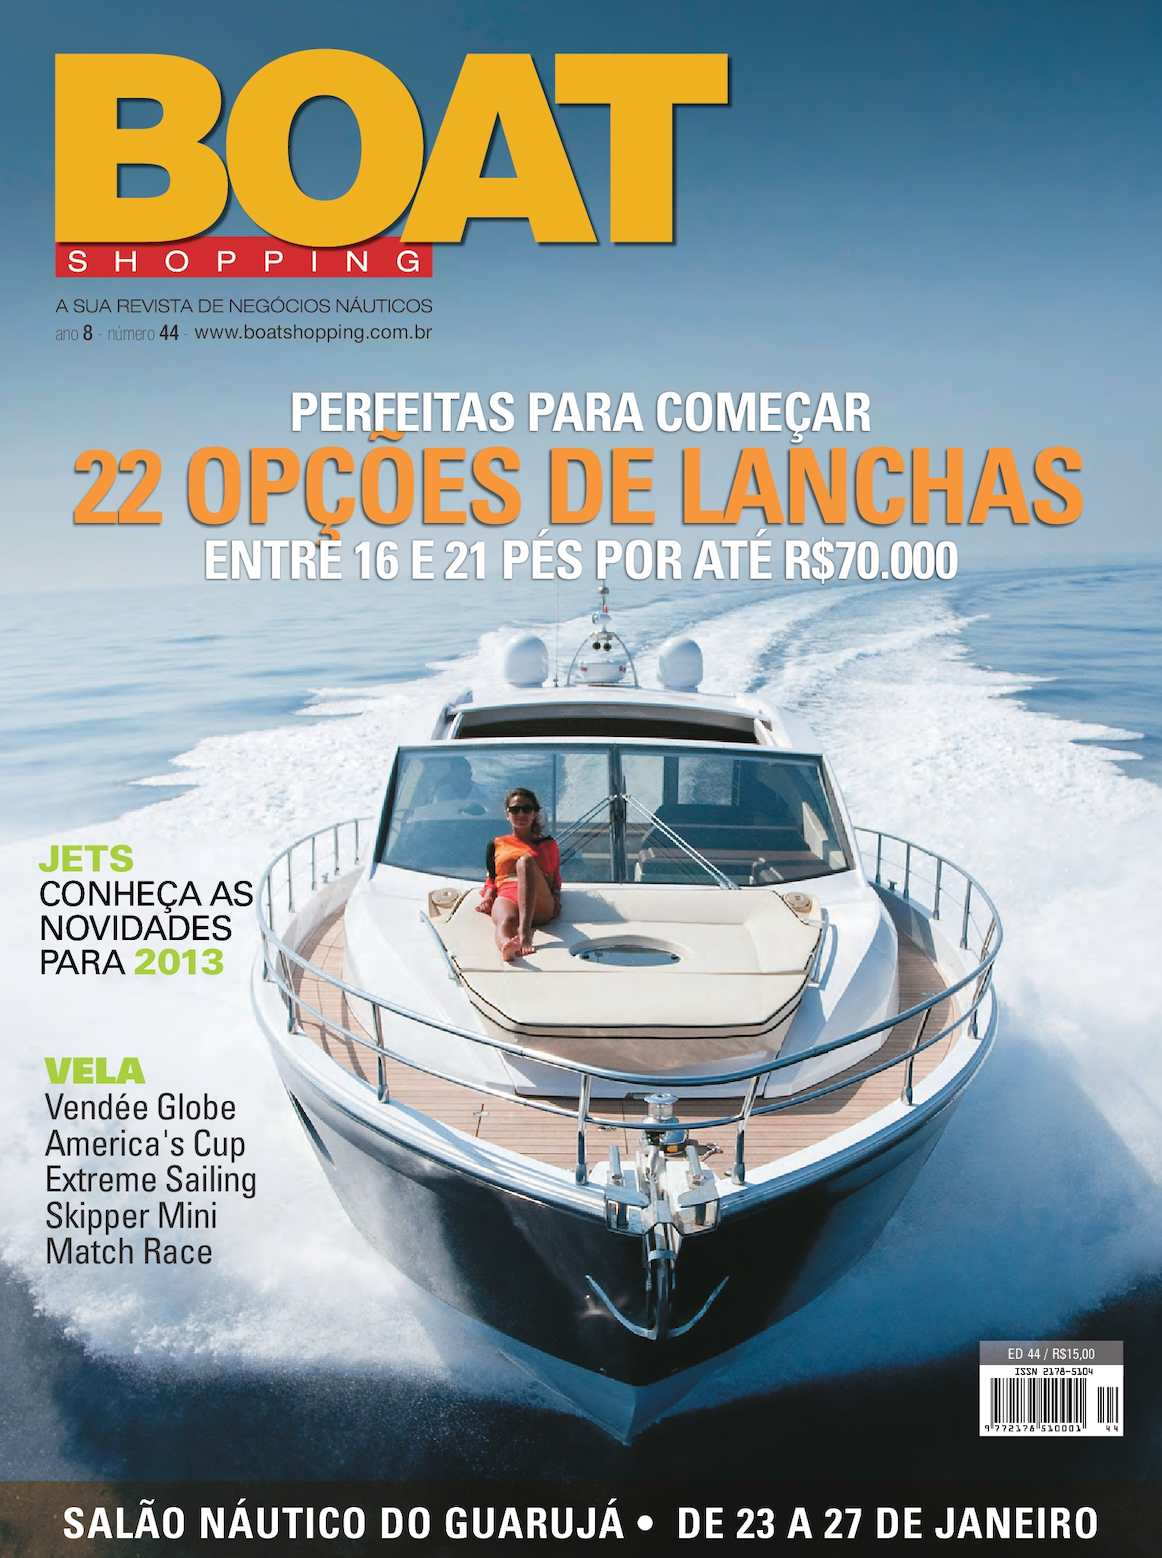 33bab4953d Calaméo - Boat Shopping  44